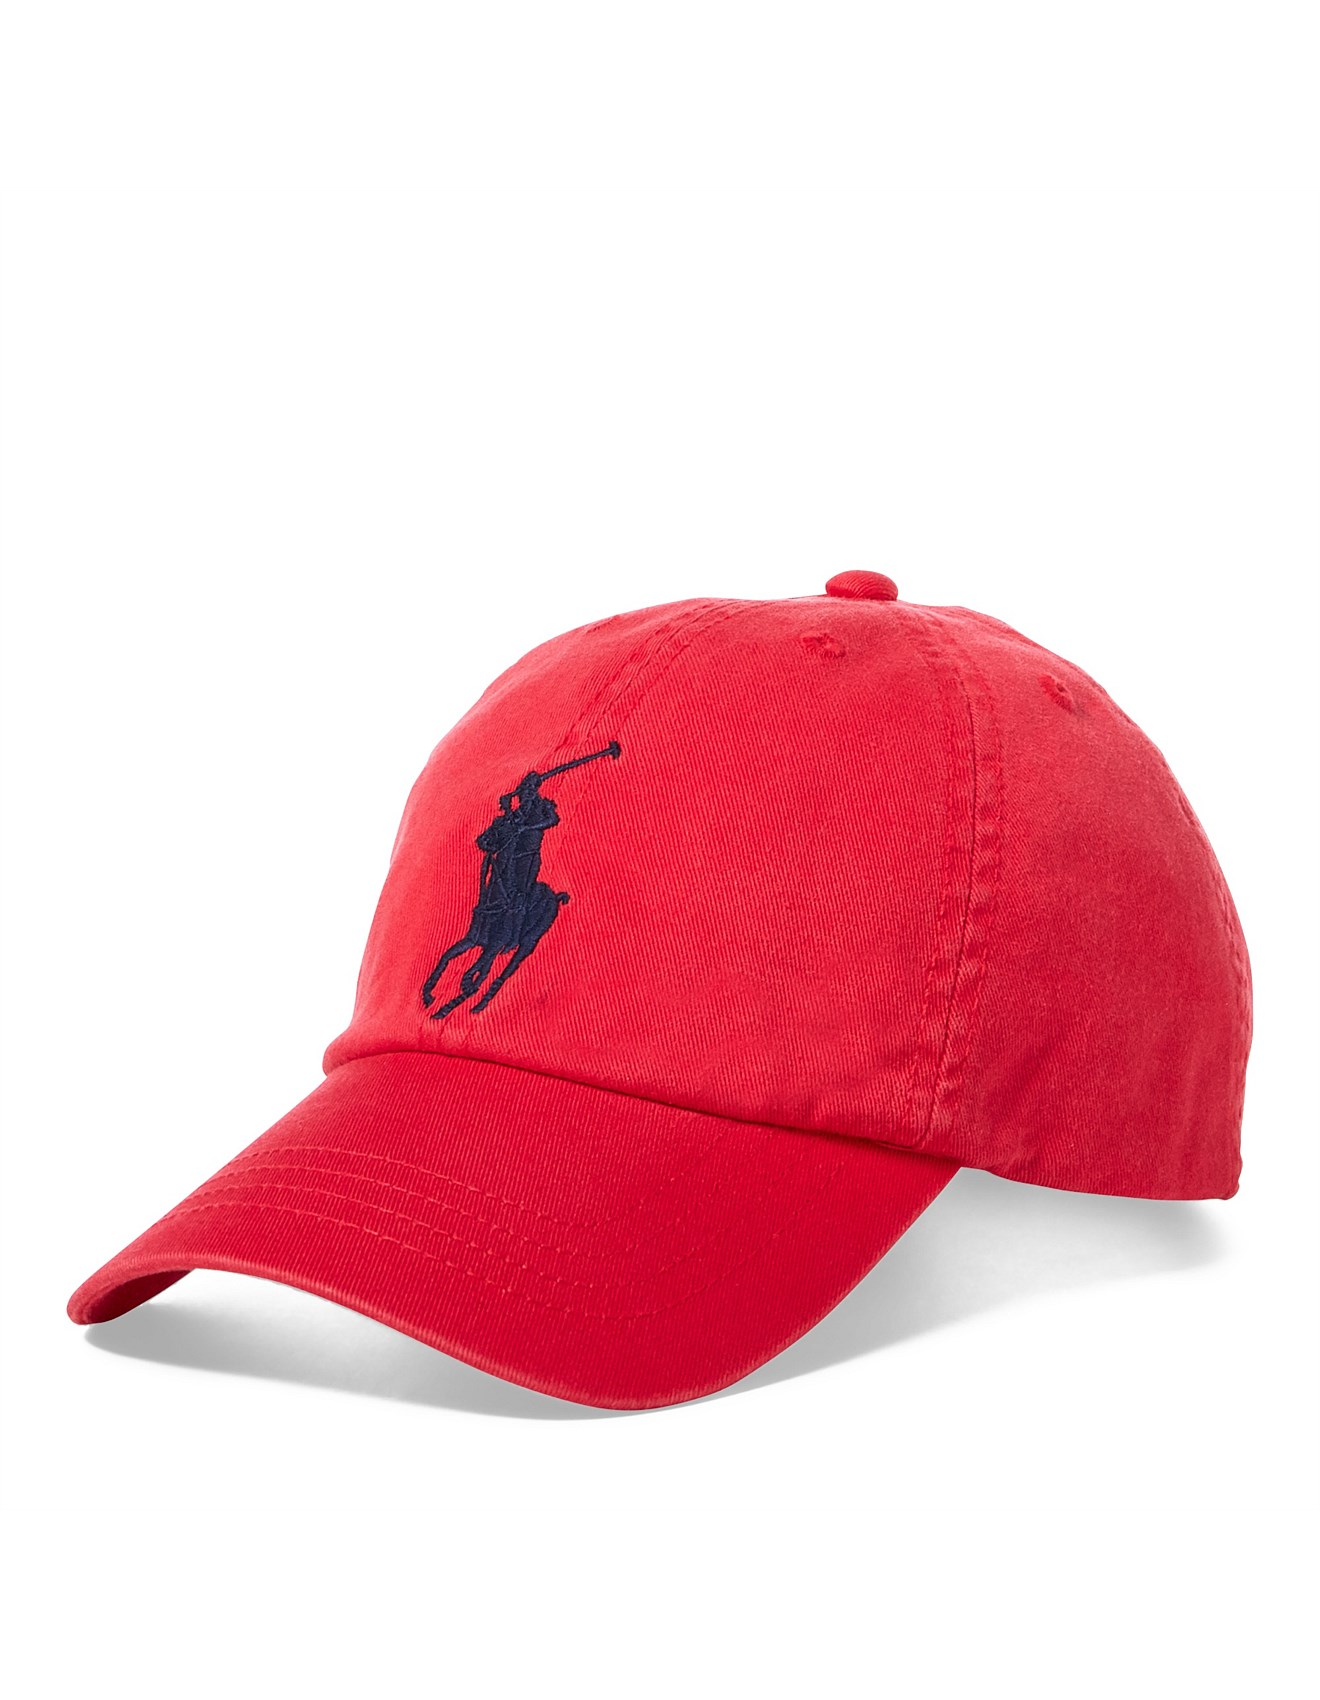 06fd58293 Big Pony Chino Baseball Cap